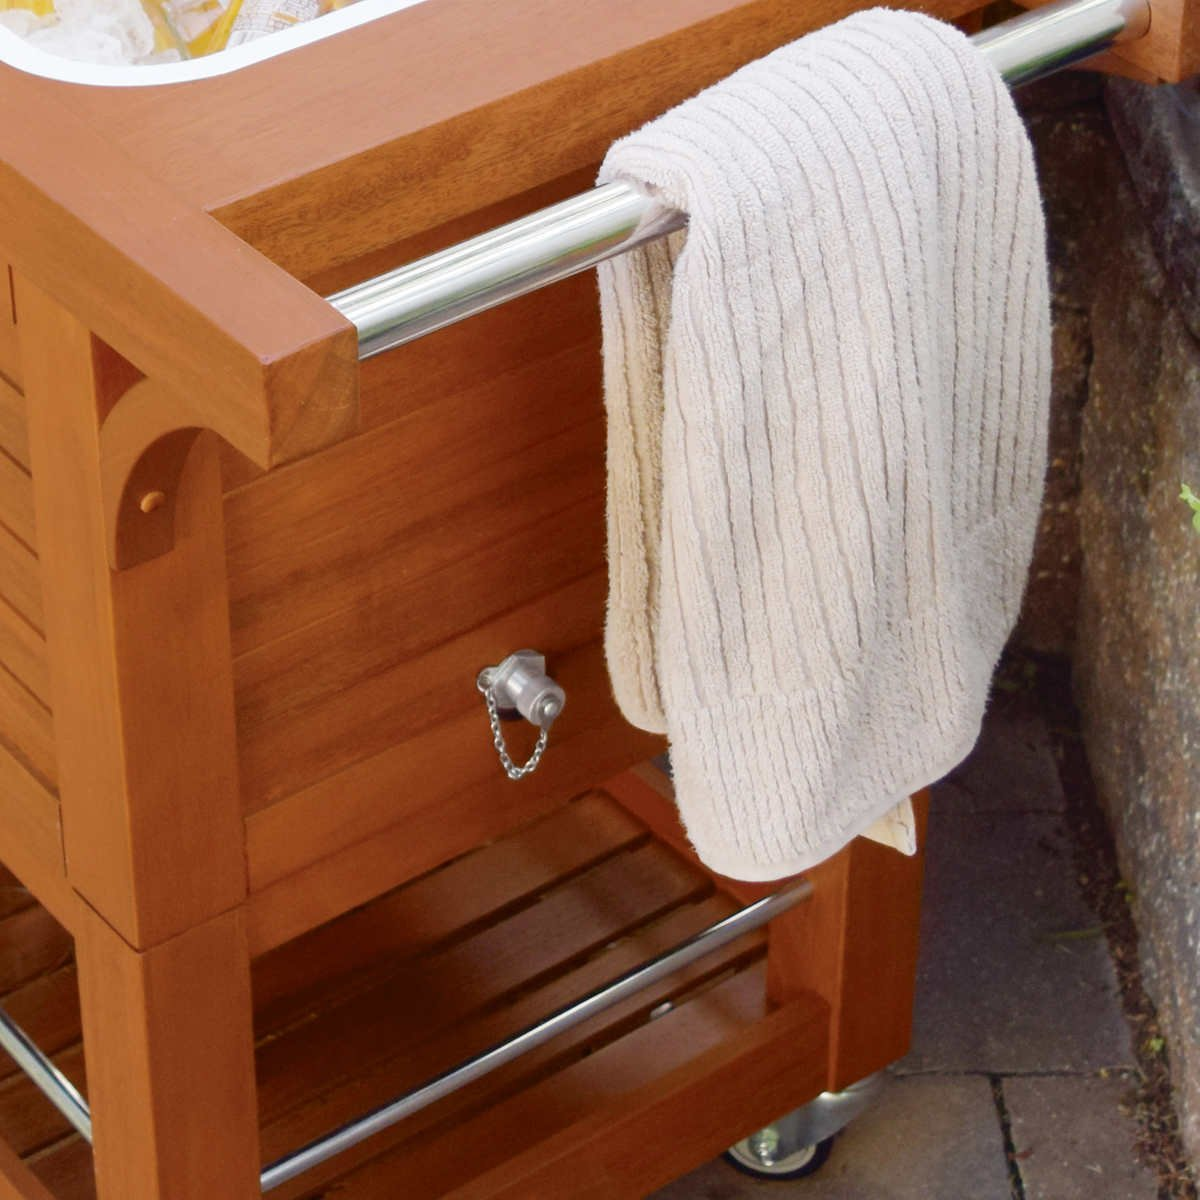 Tommy Bahama Relax 100 Quart 94.6 L Wood Rolling Cooler